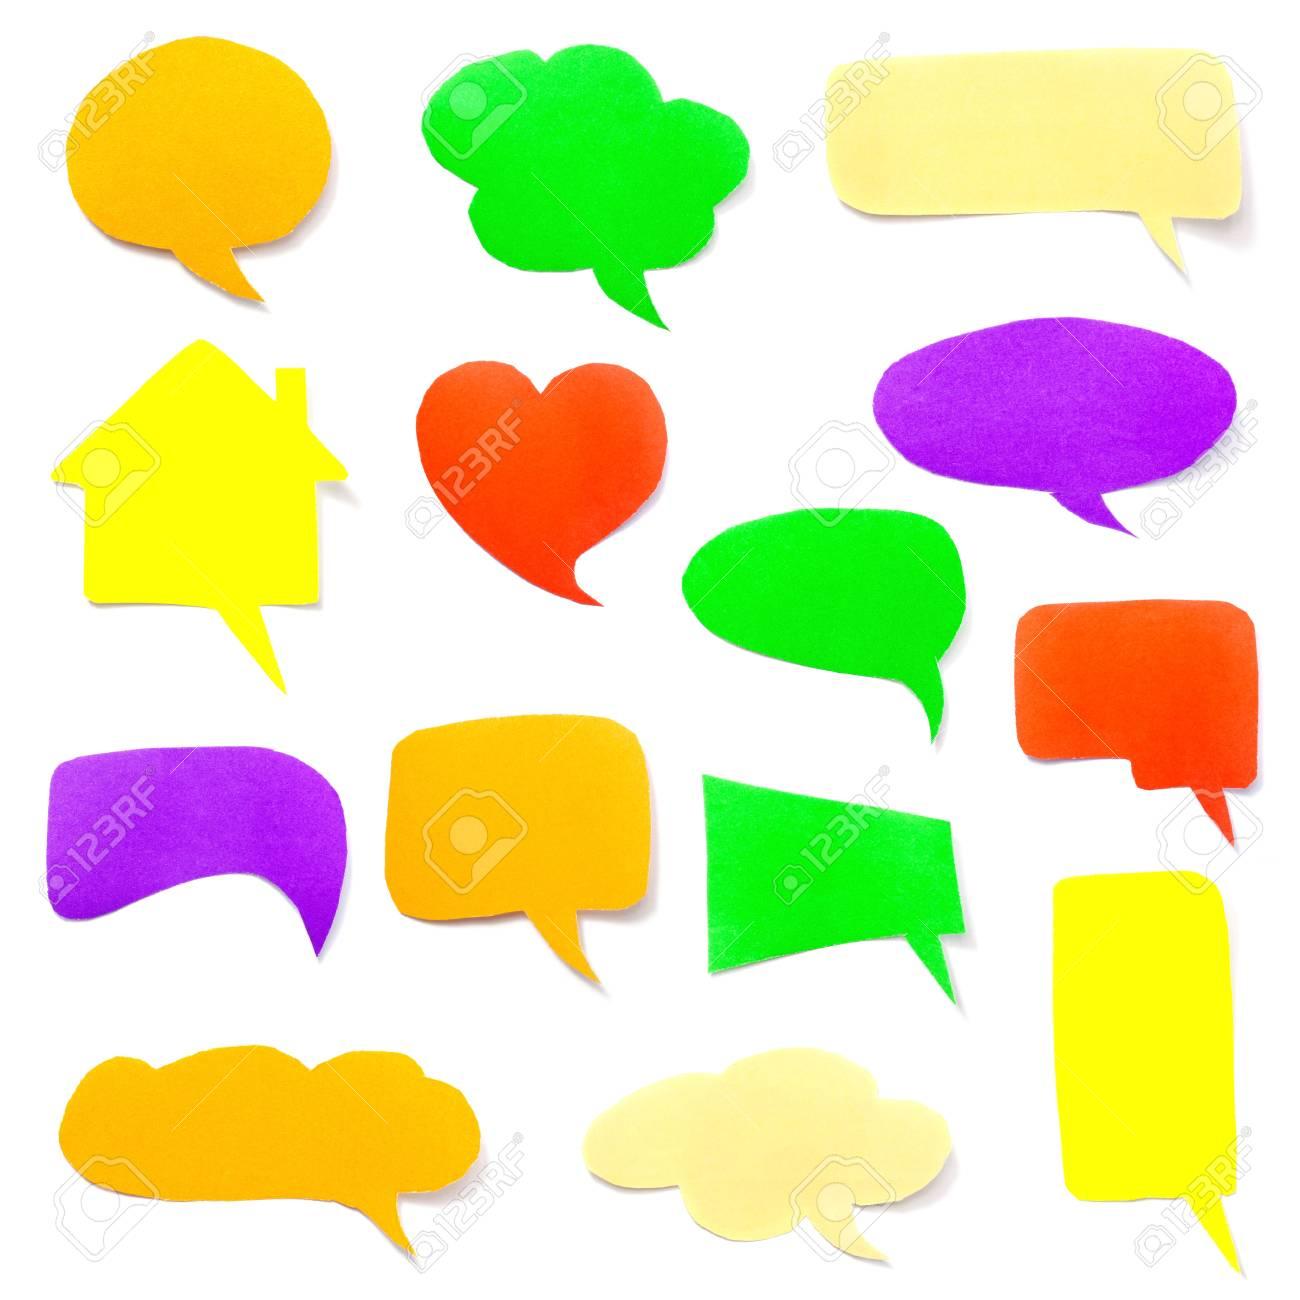 a set of colorful paper speech bubbles Stock Photo - 16991396